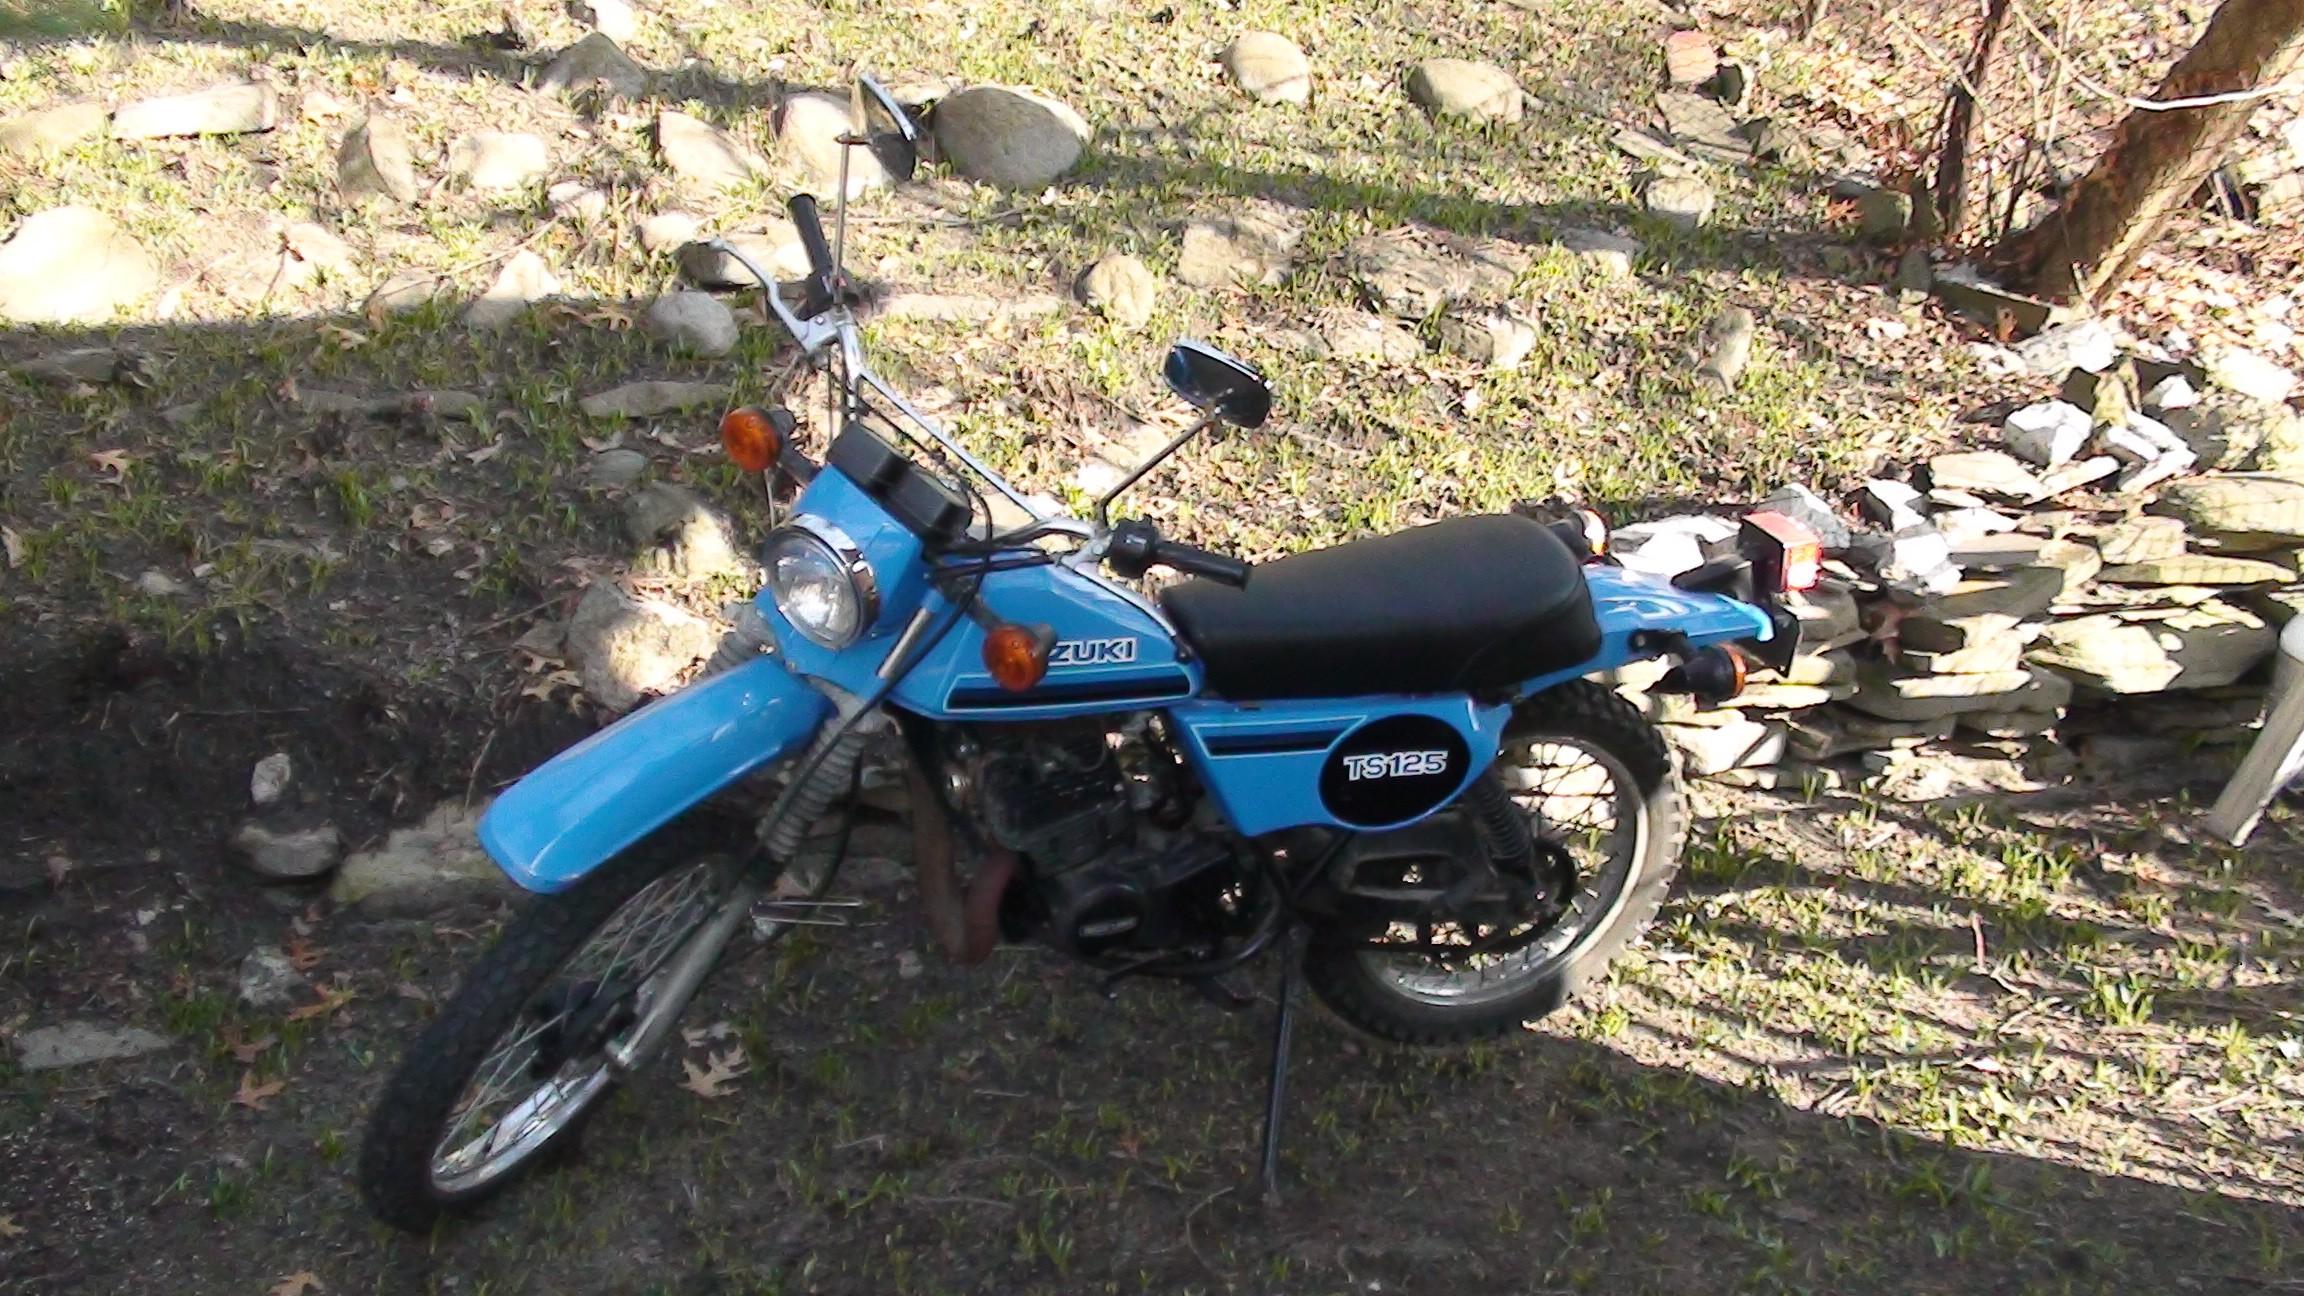 Suzuki Dirt Bike Price